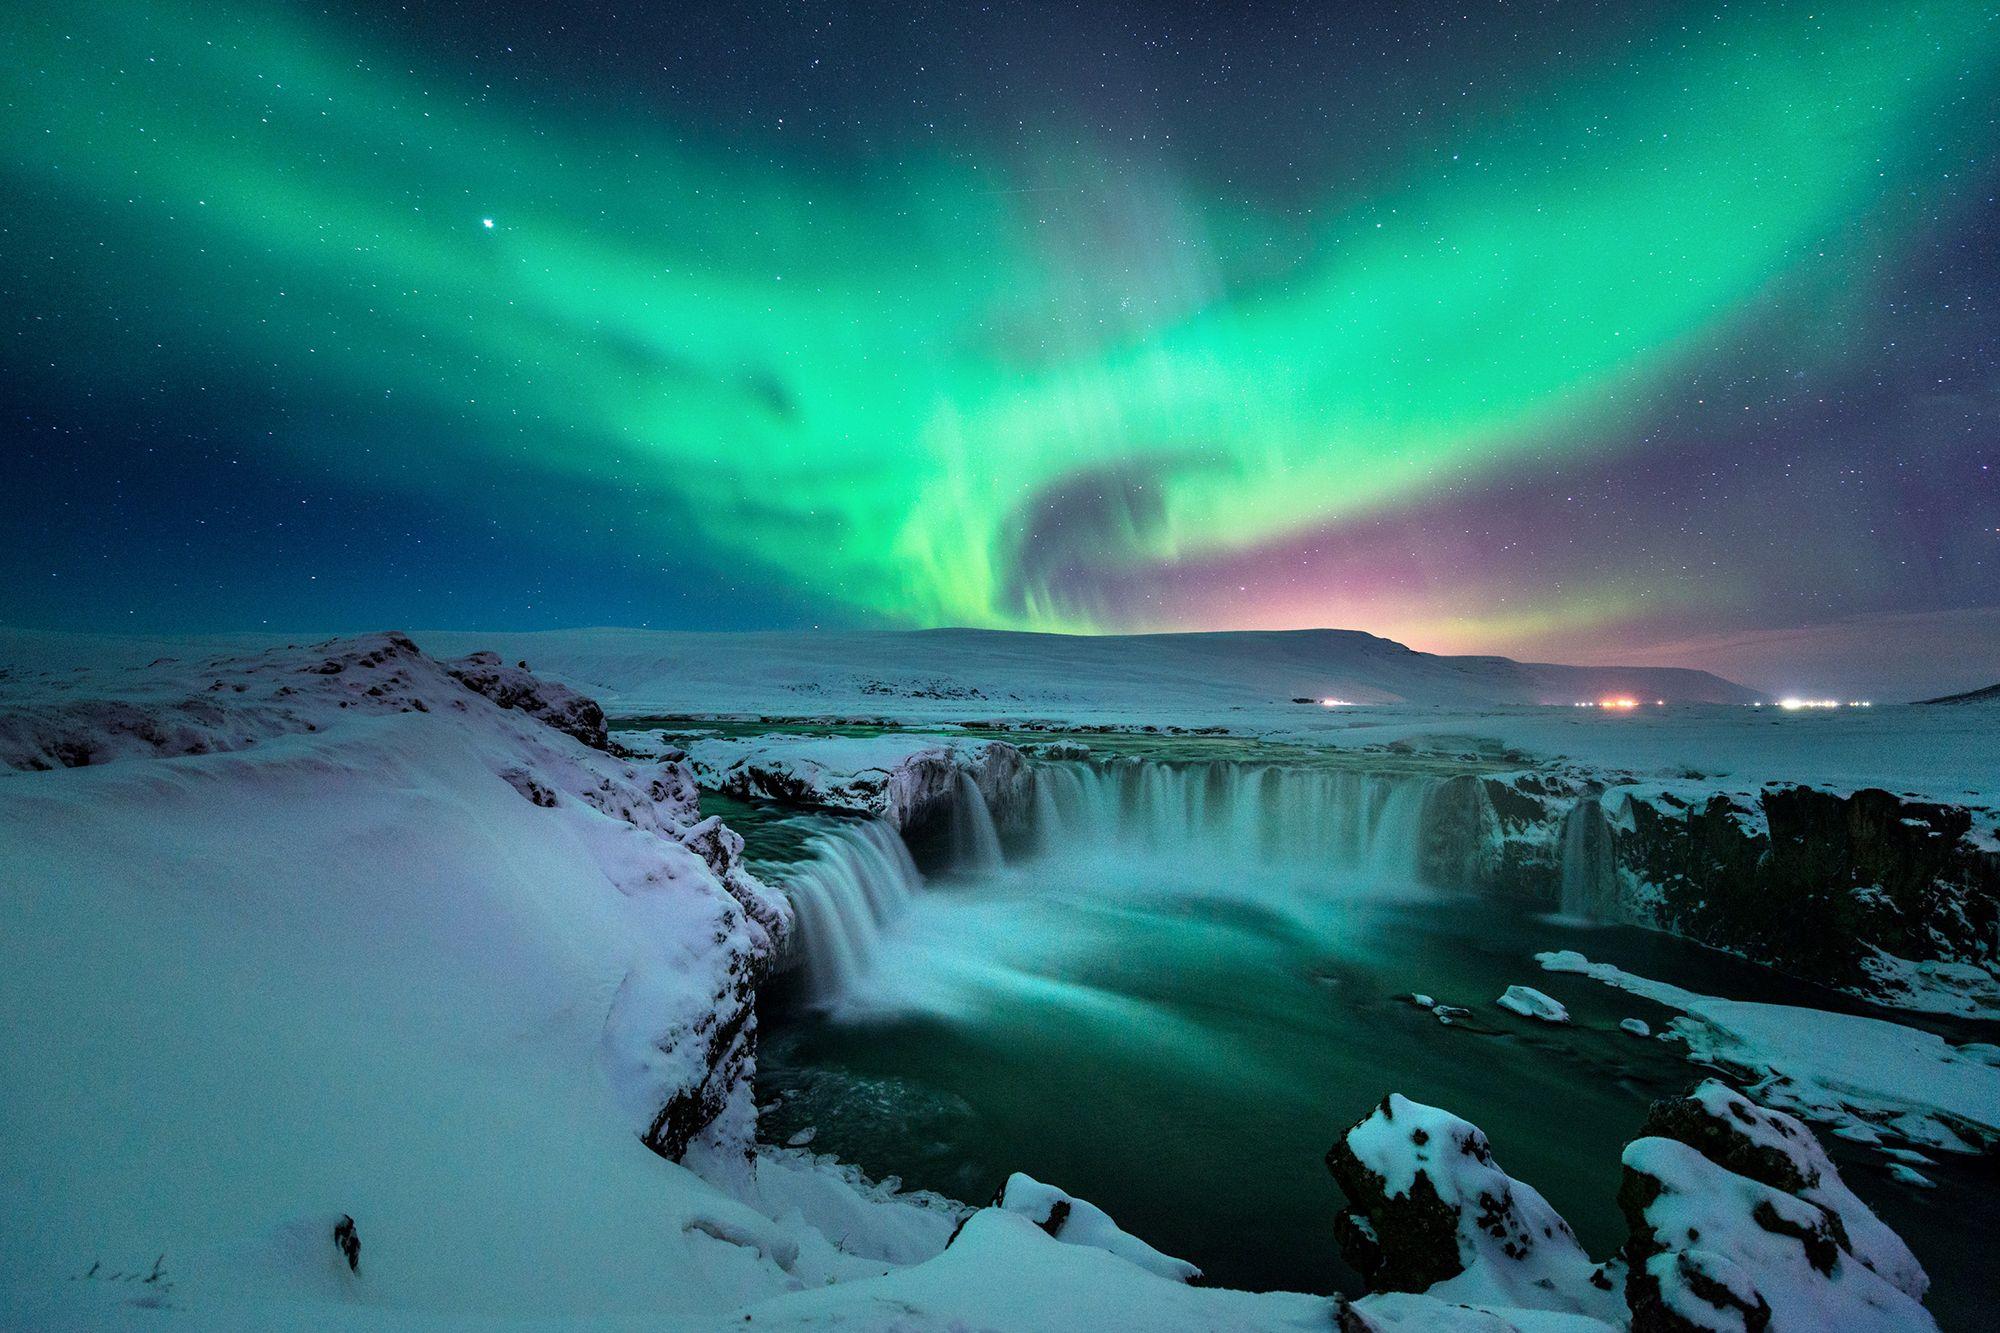 A stunning aurora shape like phoenix bird appears above the landscape of Godafoss water fall in winter Iceland